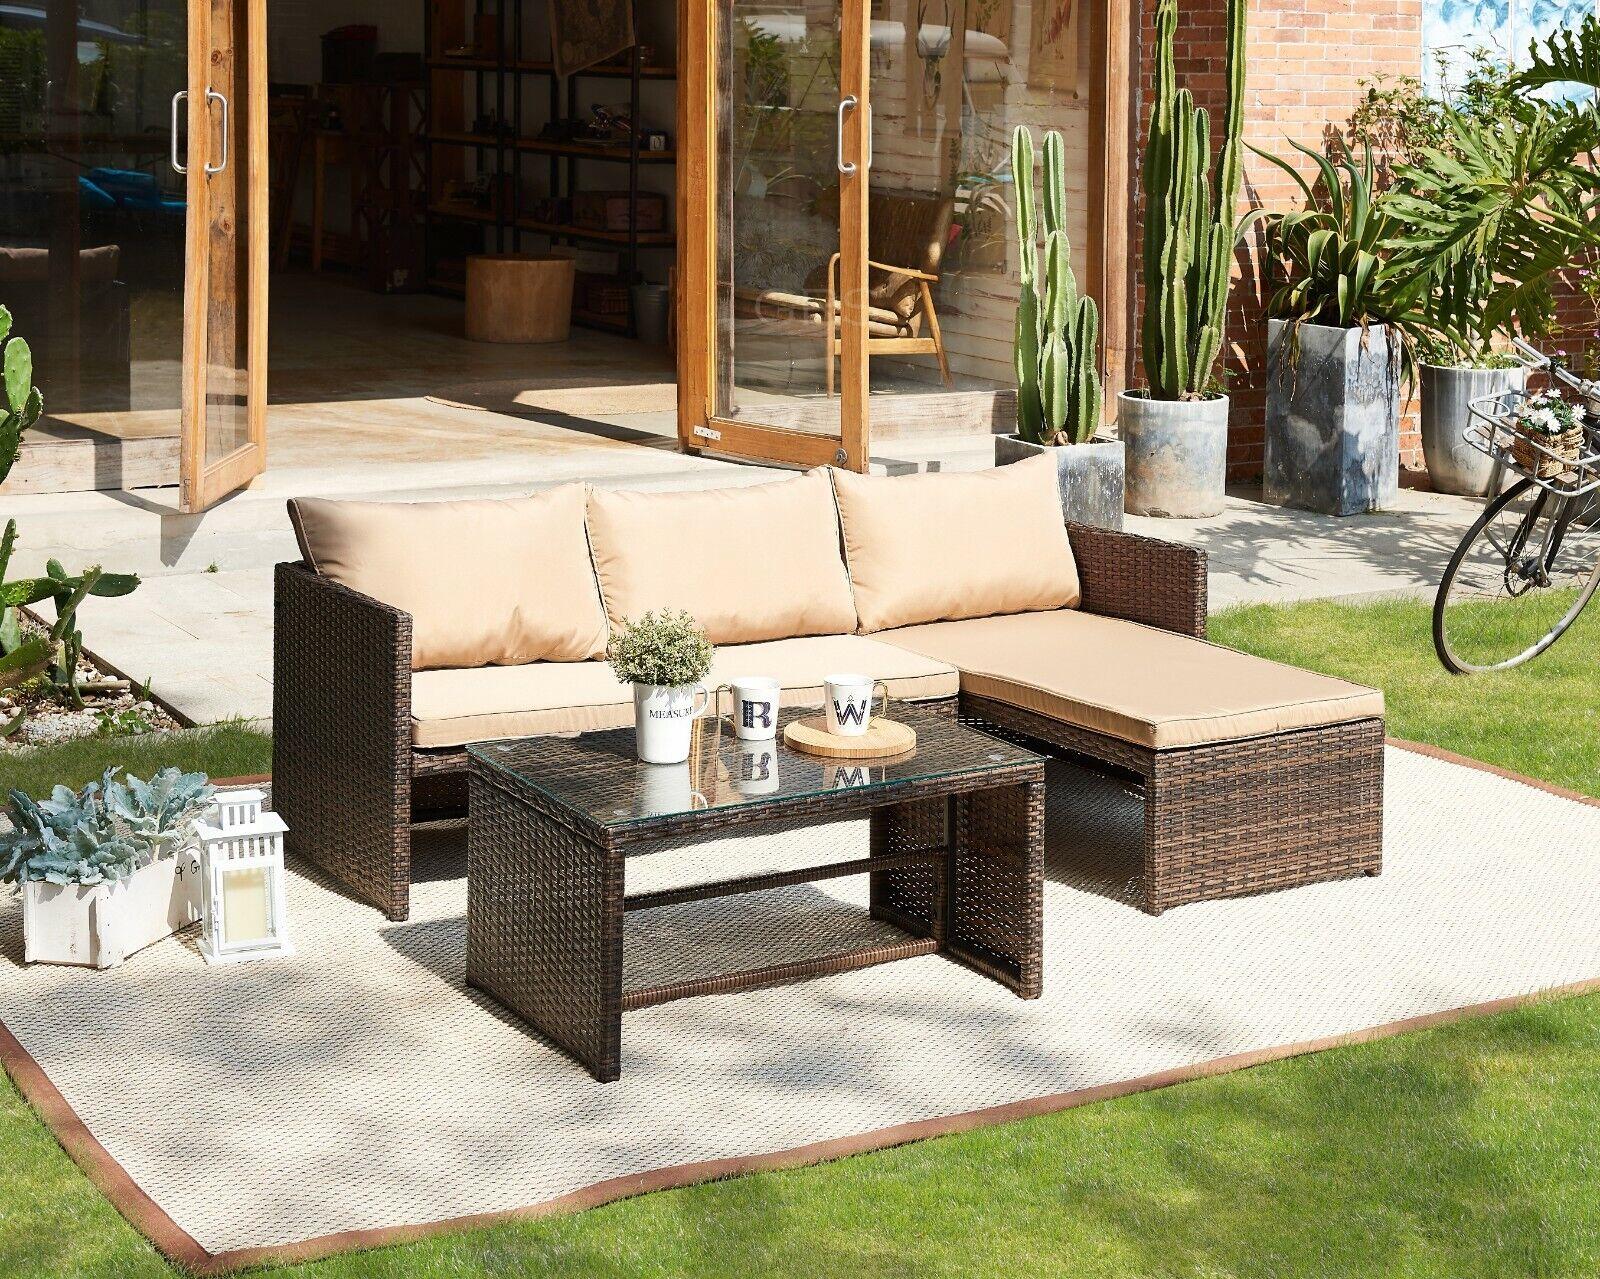 Garden Furniture - Rattan Garden Furniture Sofa Set Brown or Black Patio Outdoor Corner Lounge Seat